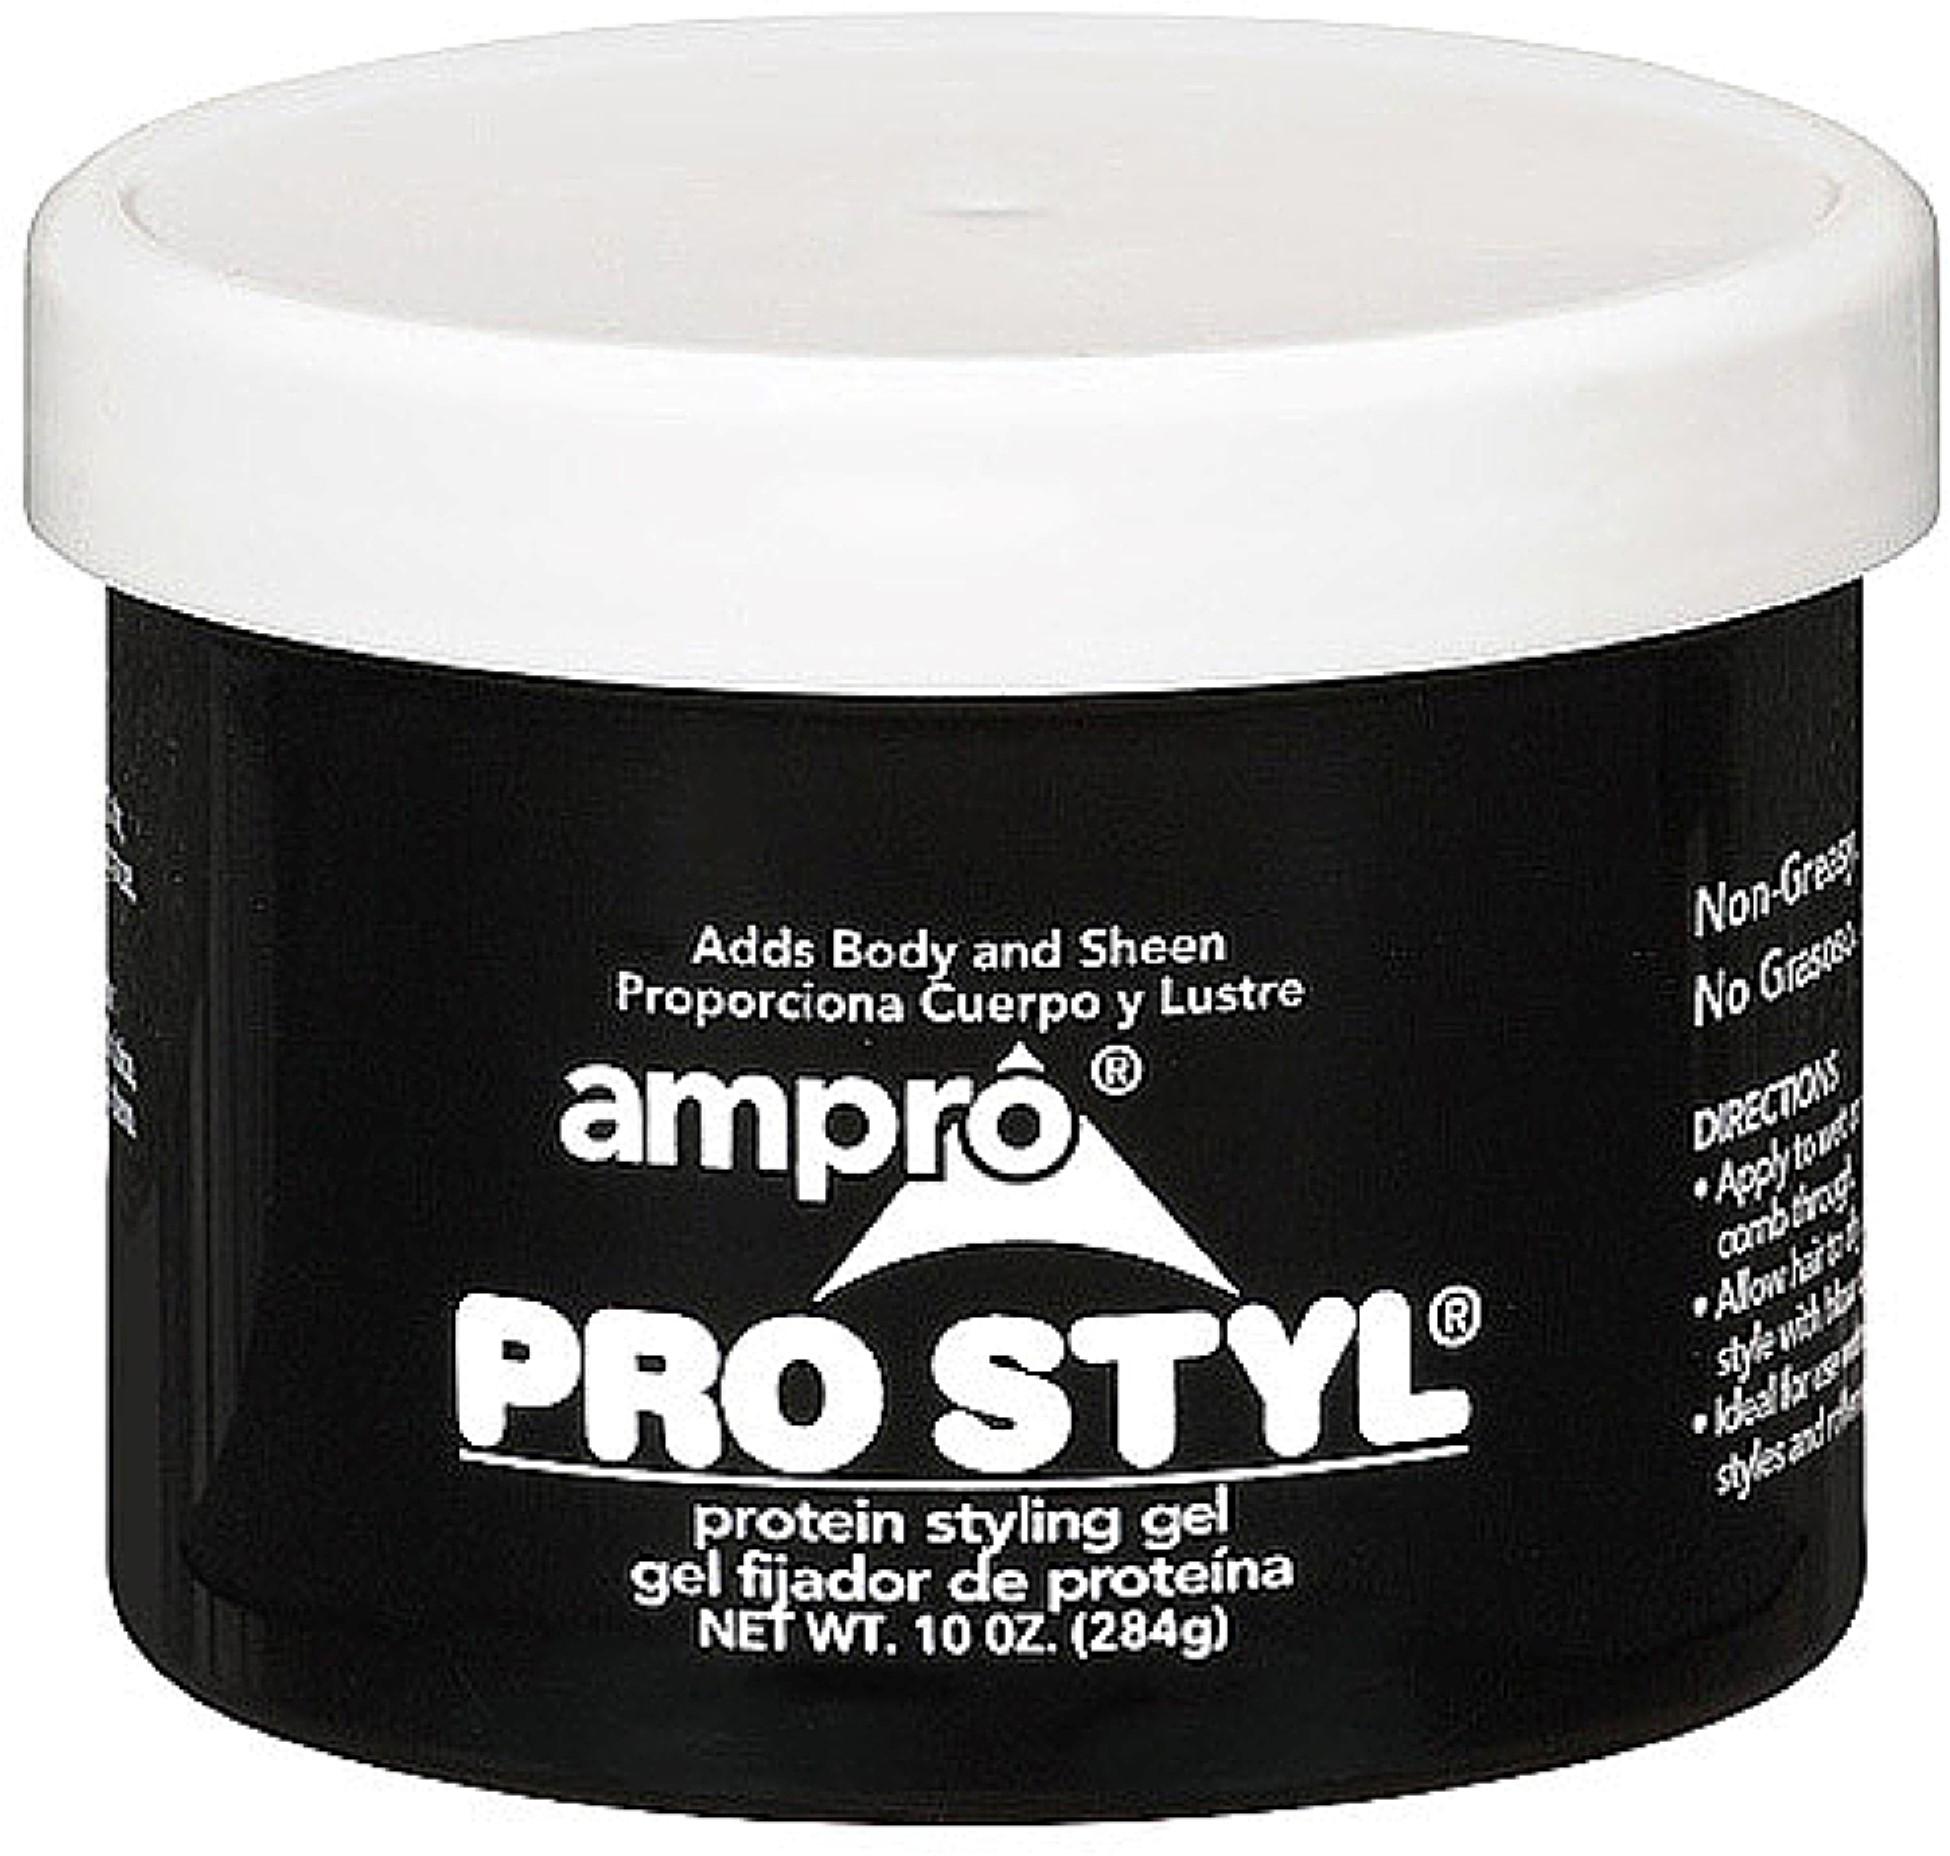 Ampro Pro Styl Protein Styling Gel, 10 oz